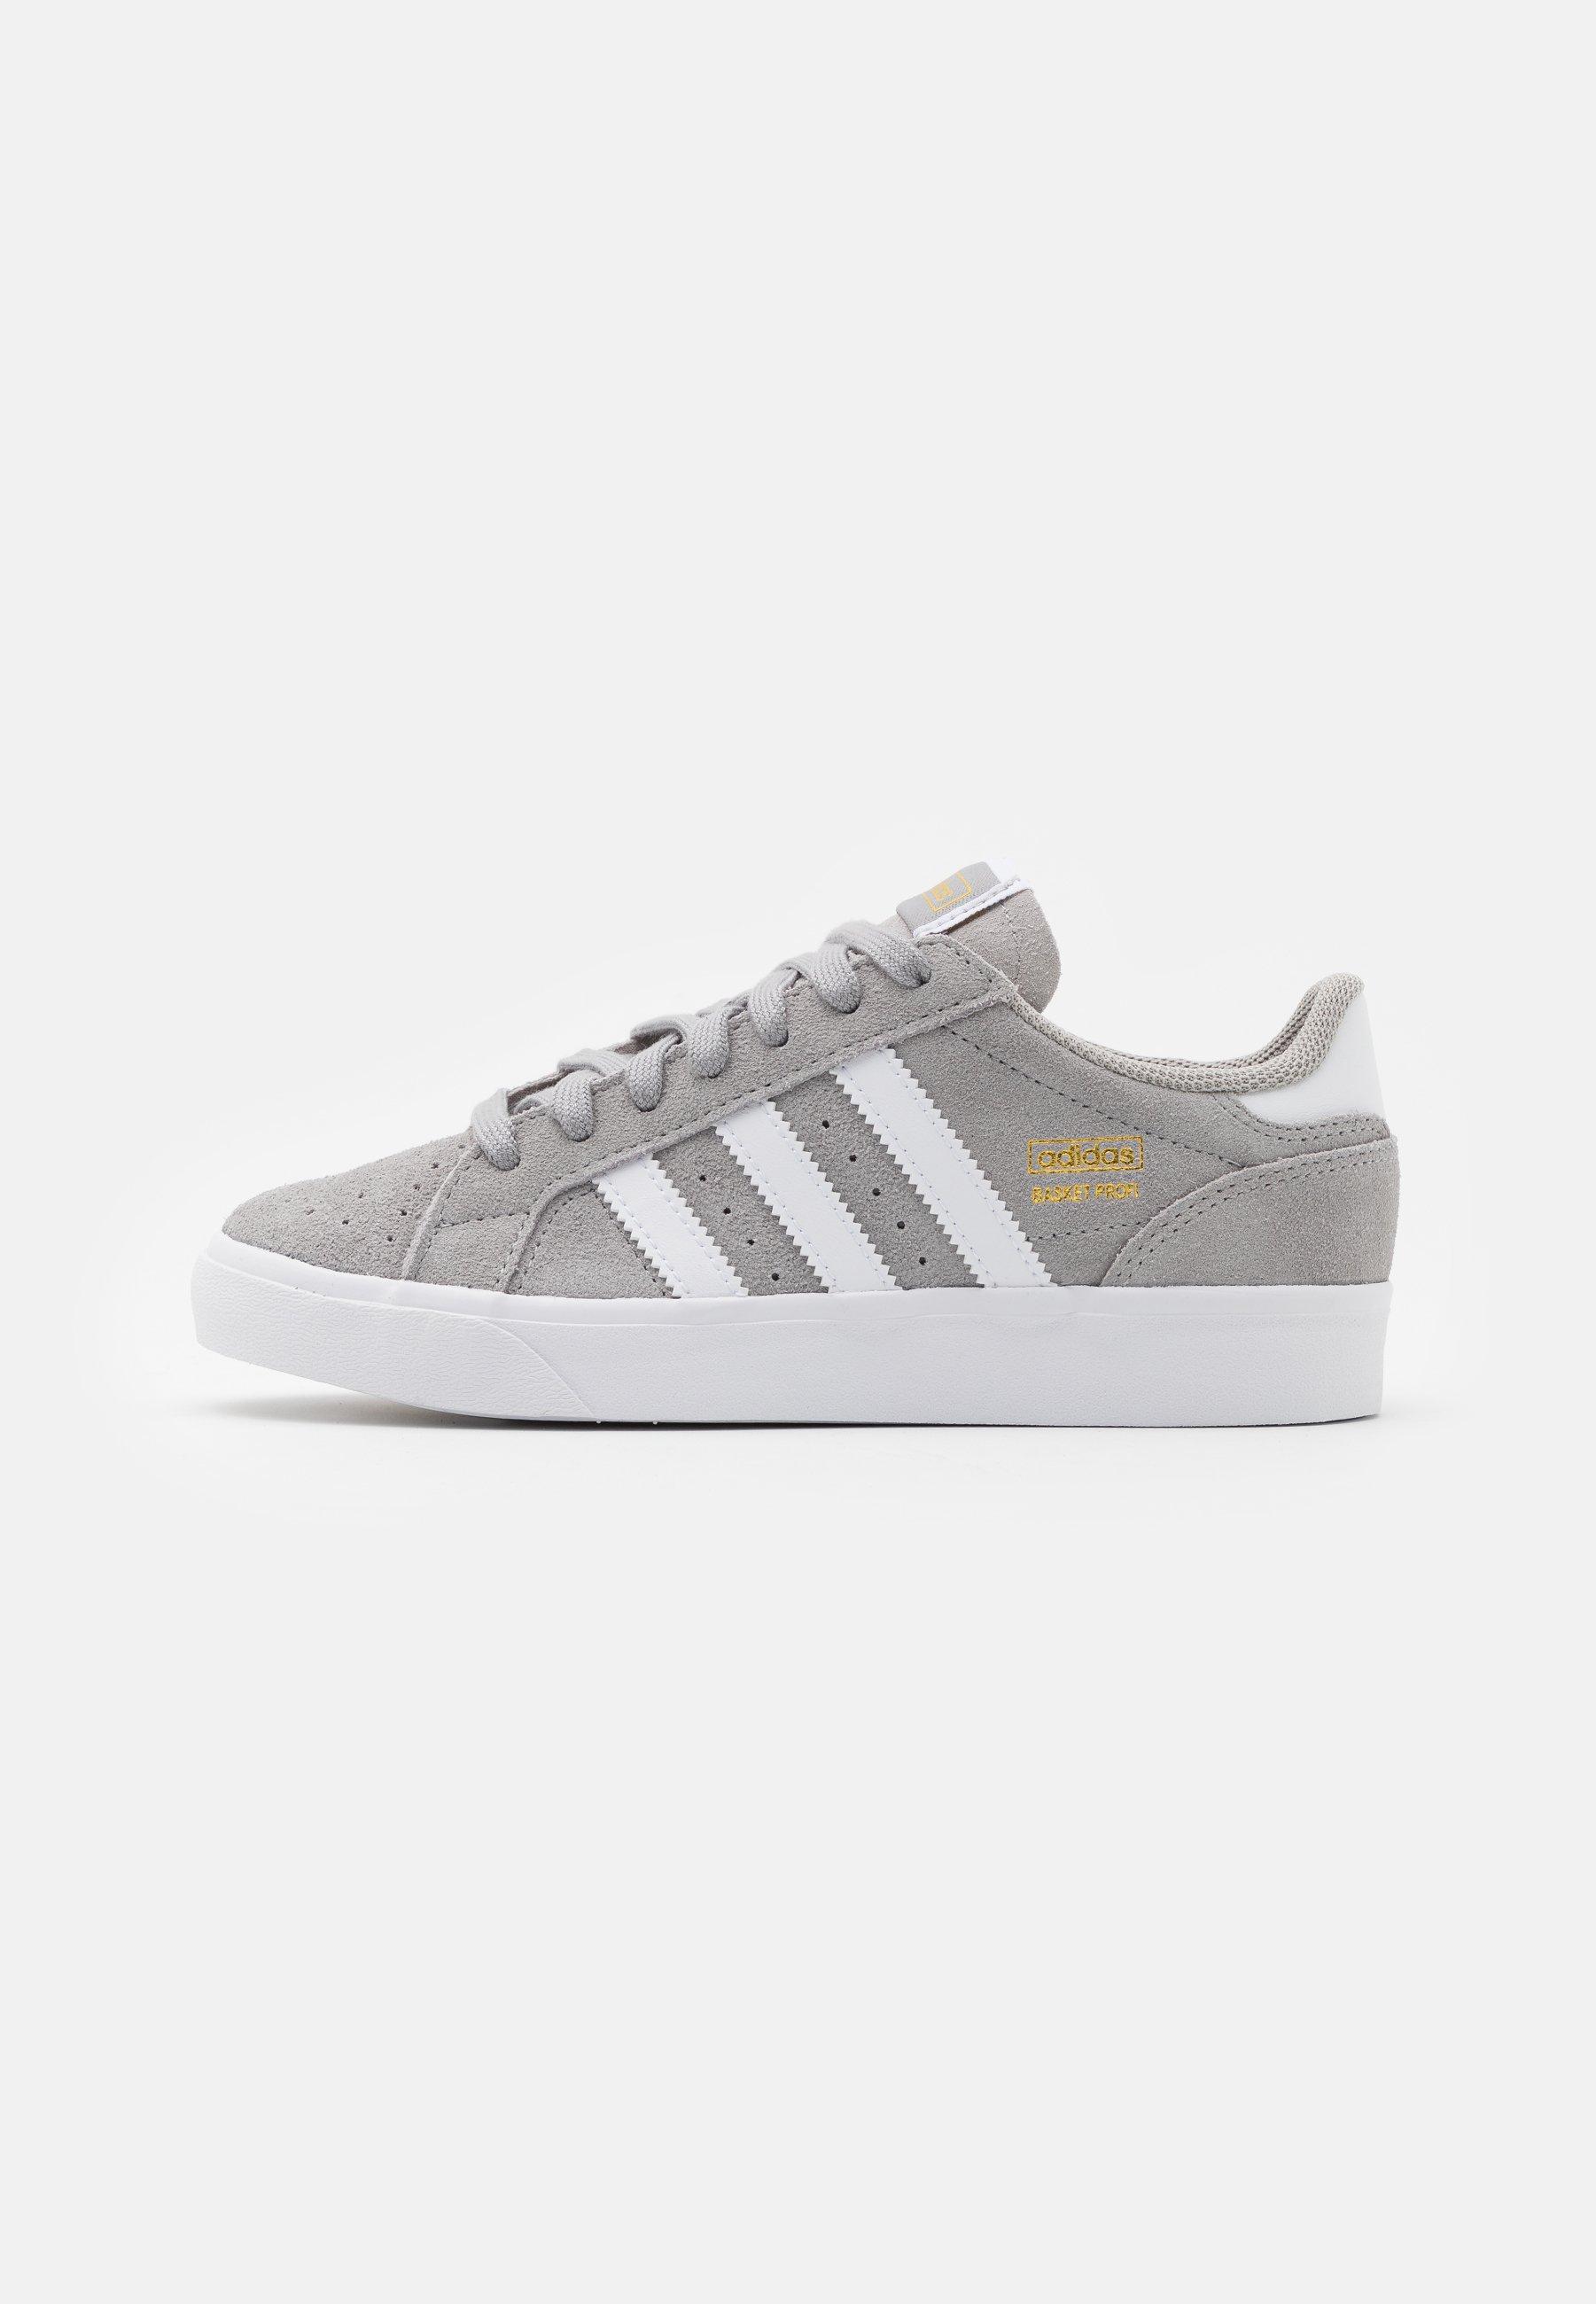 BASKET PROFI UNISEX - Sneakers basse - solid grey/footwear white/gold metallic